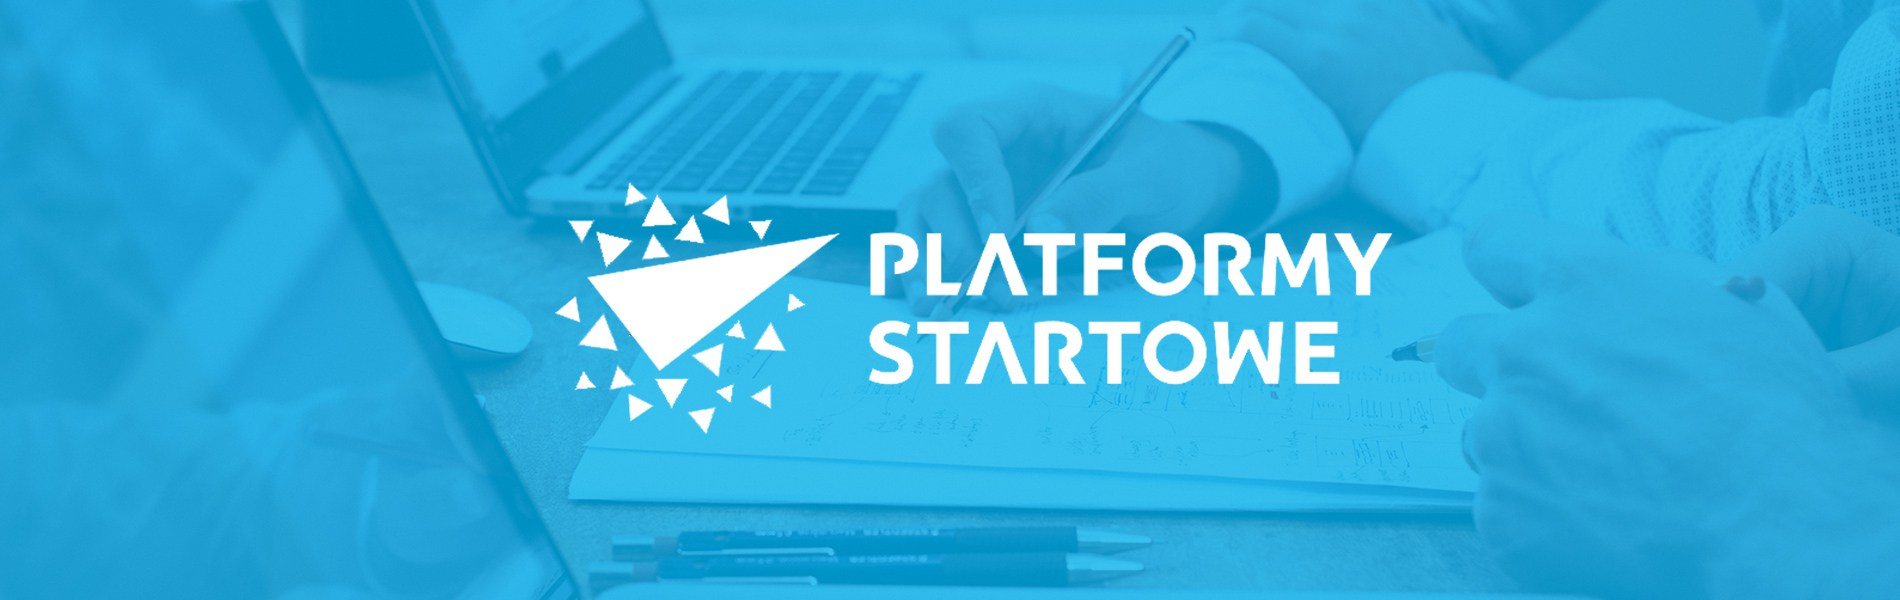 platformy startowe logo